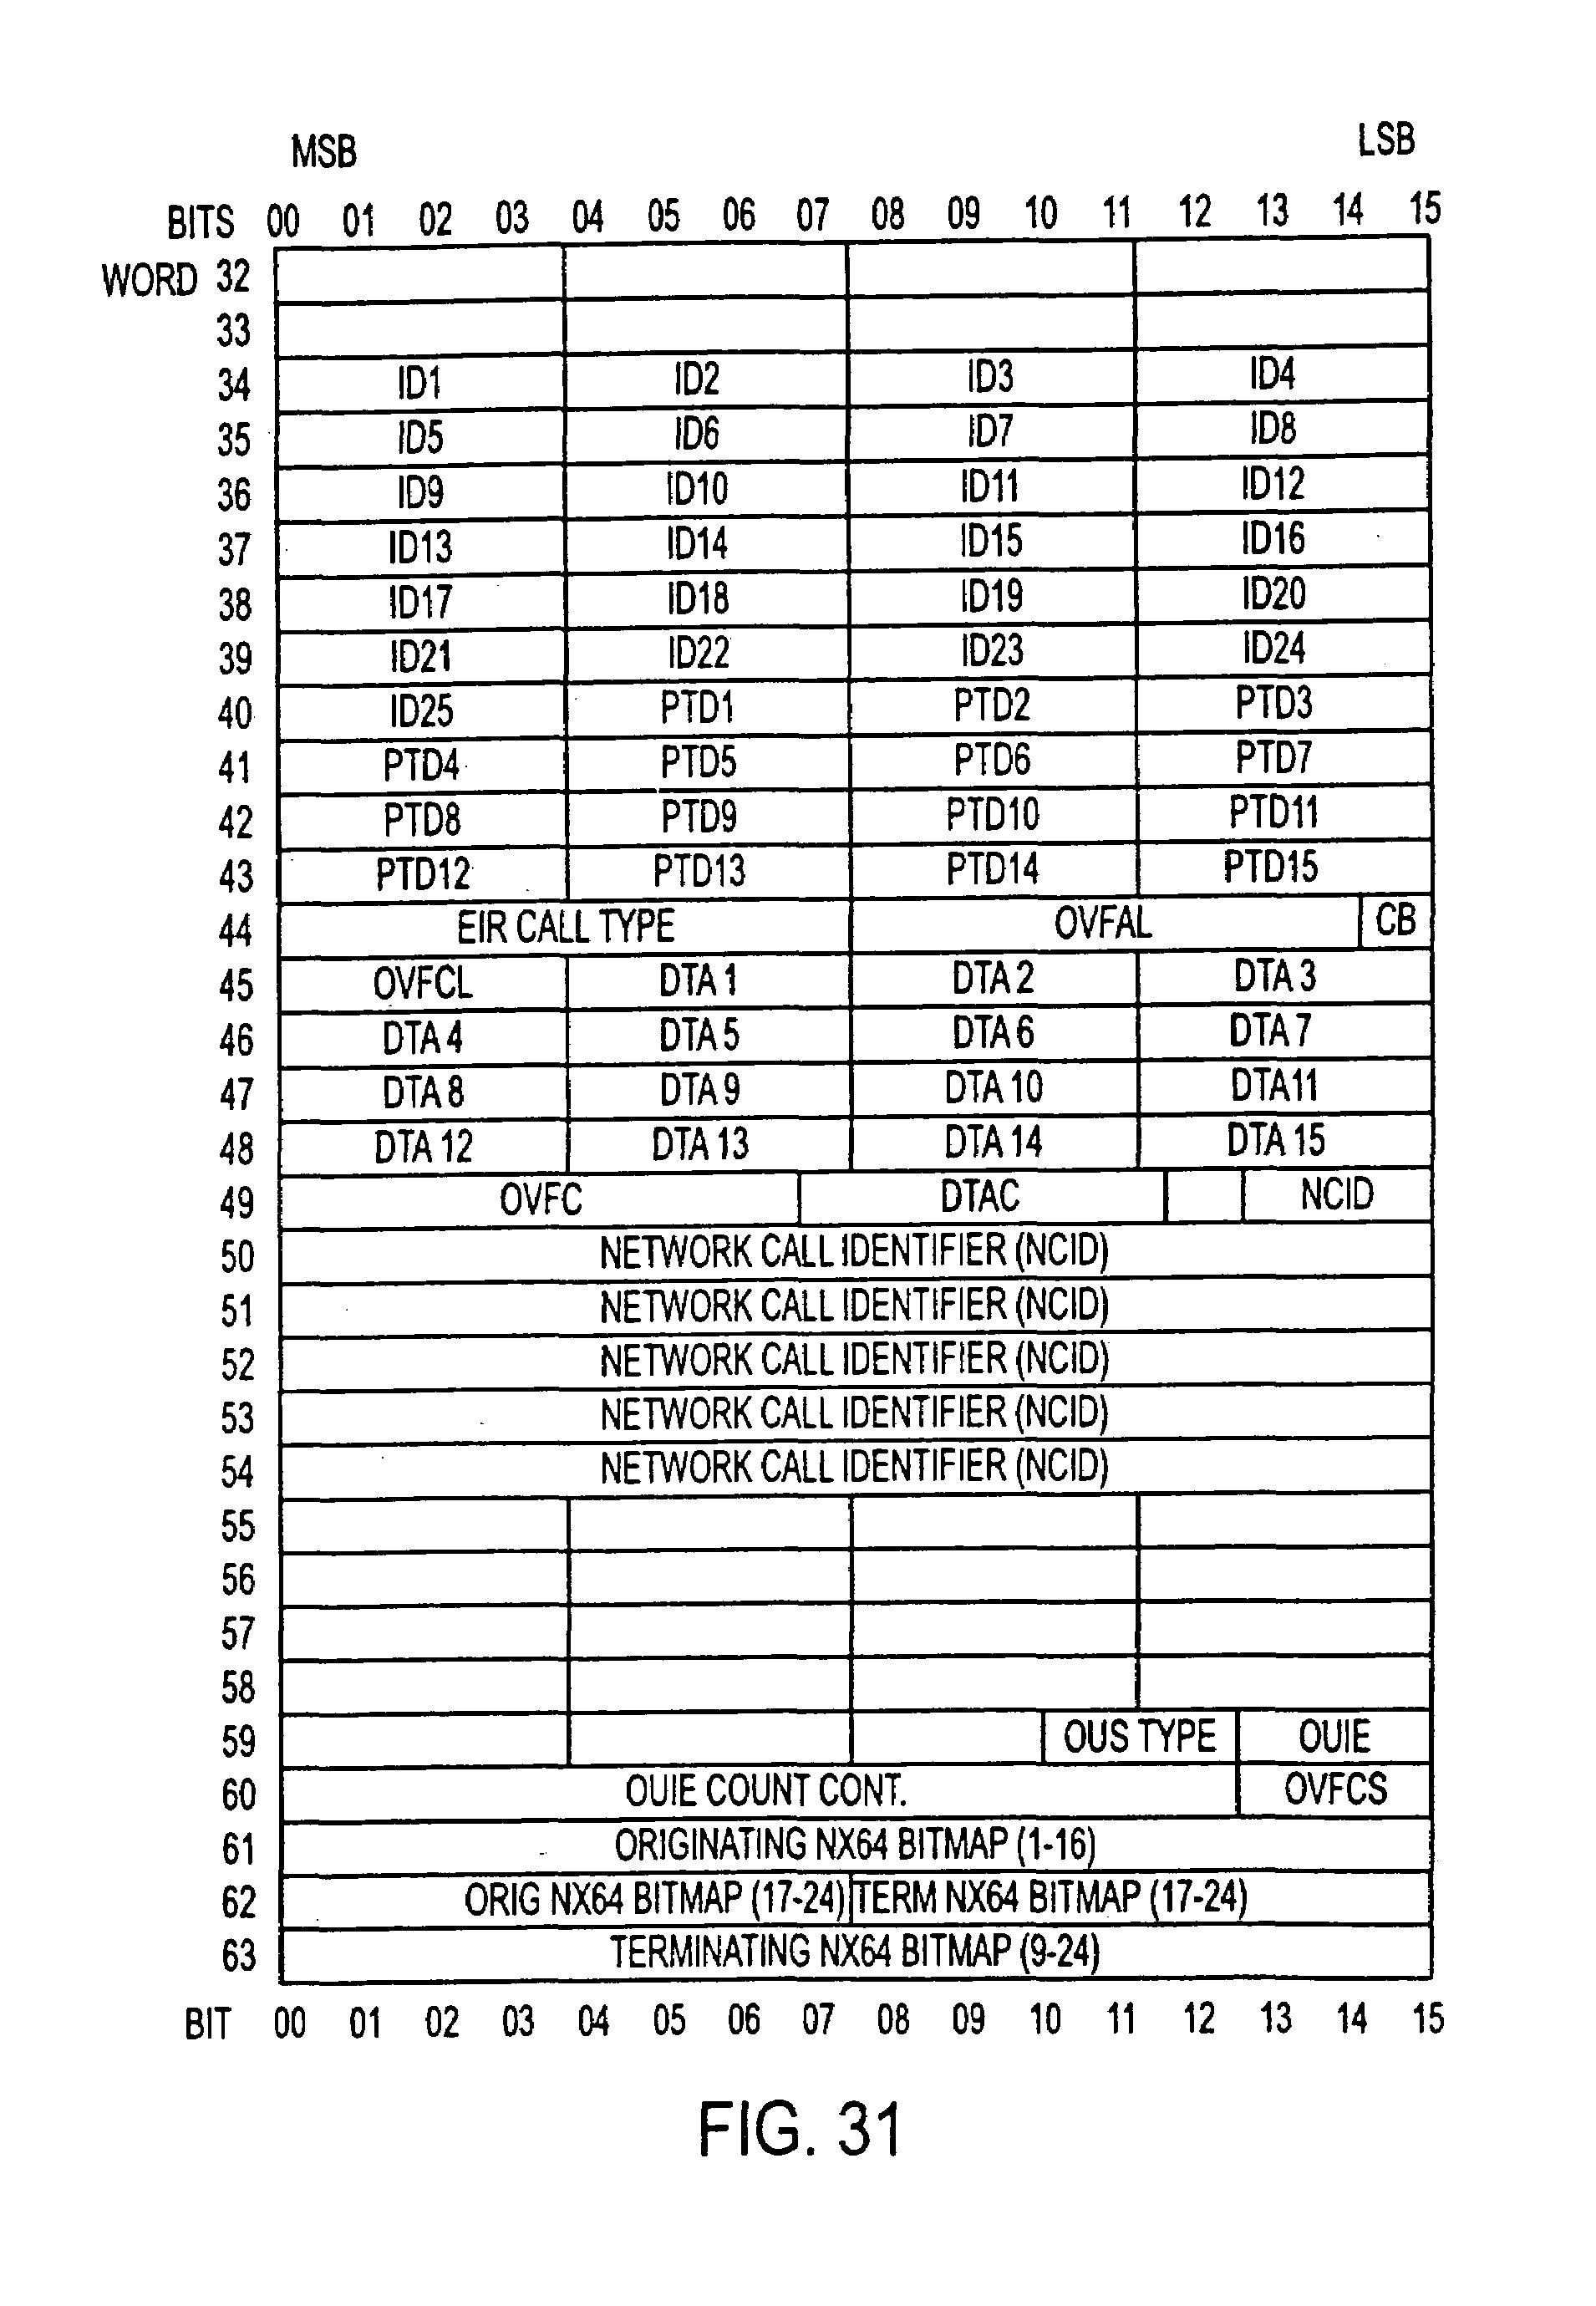 Patent US 7,124,101 B1